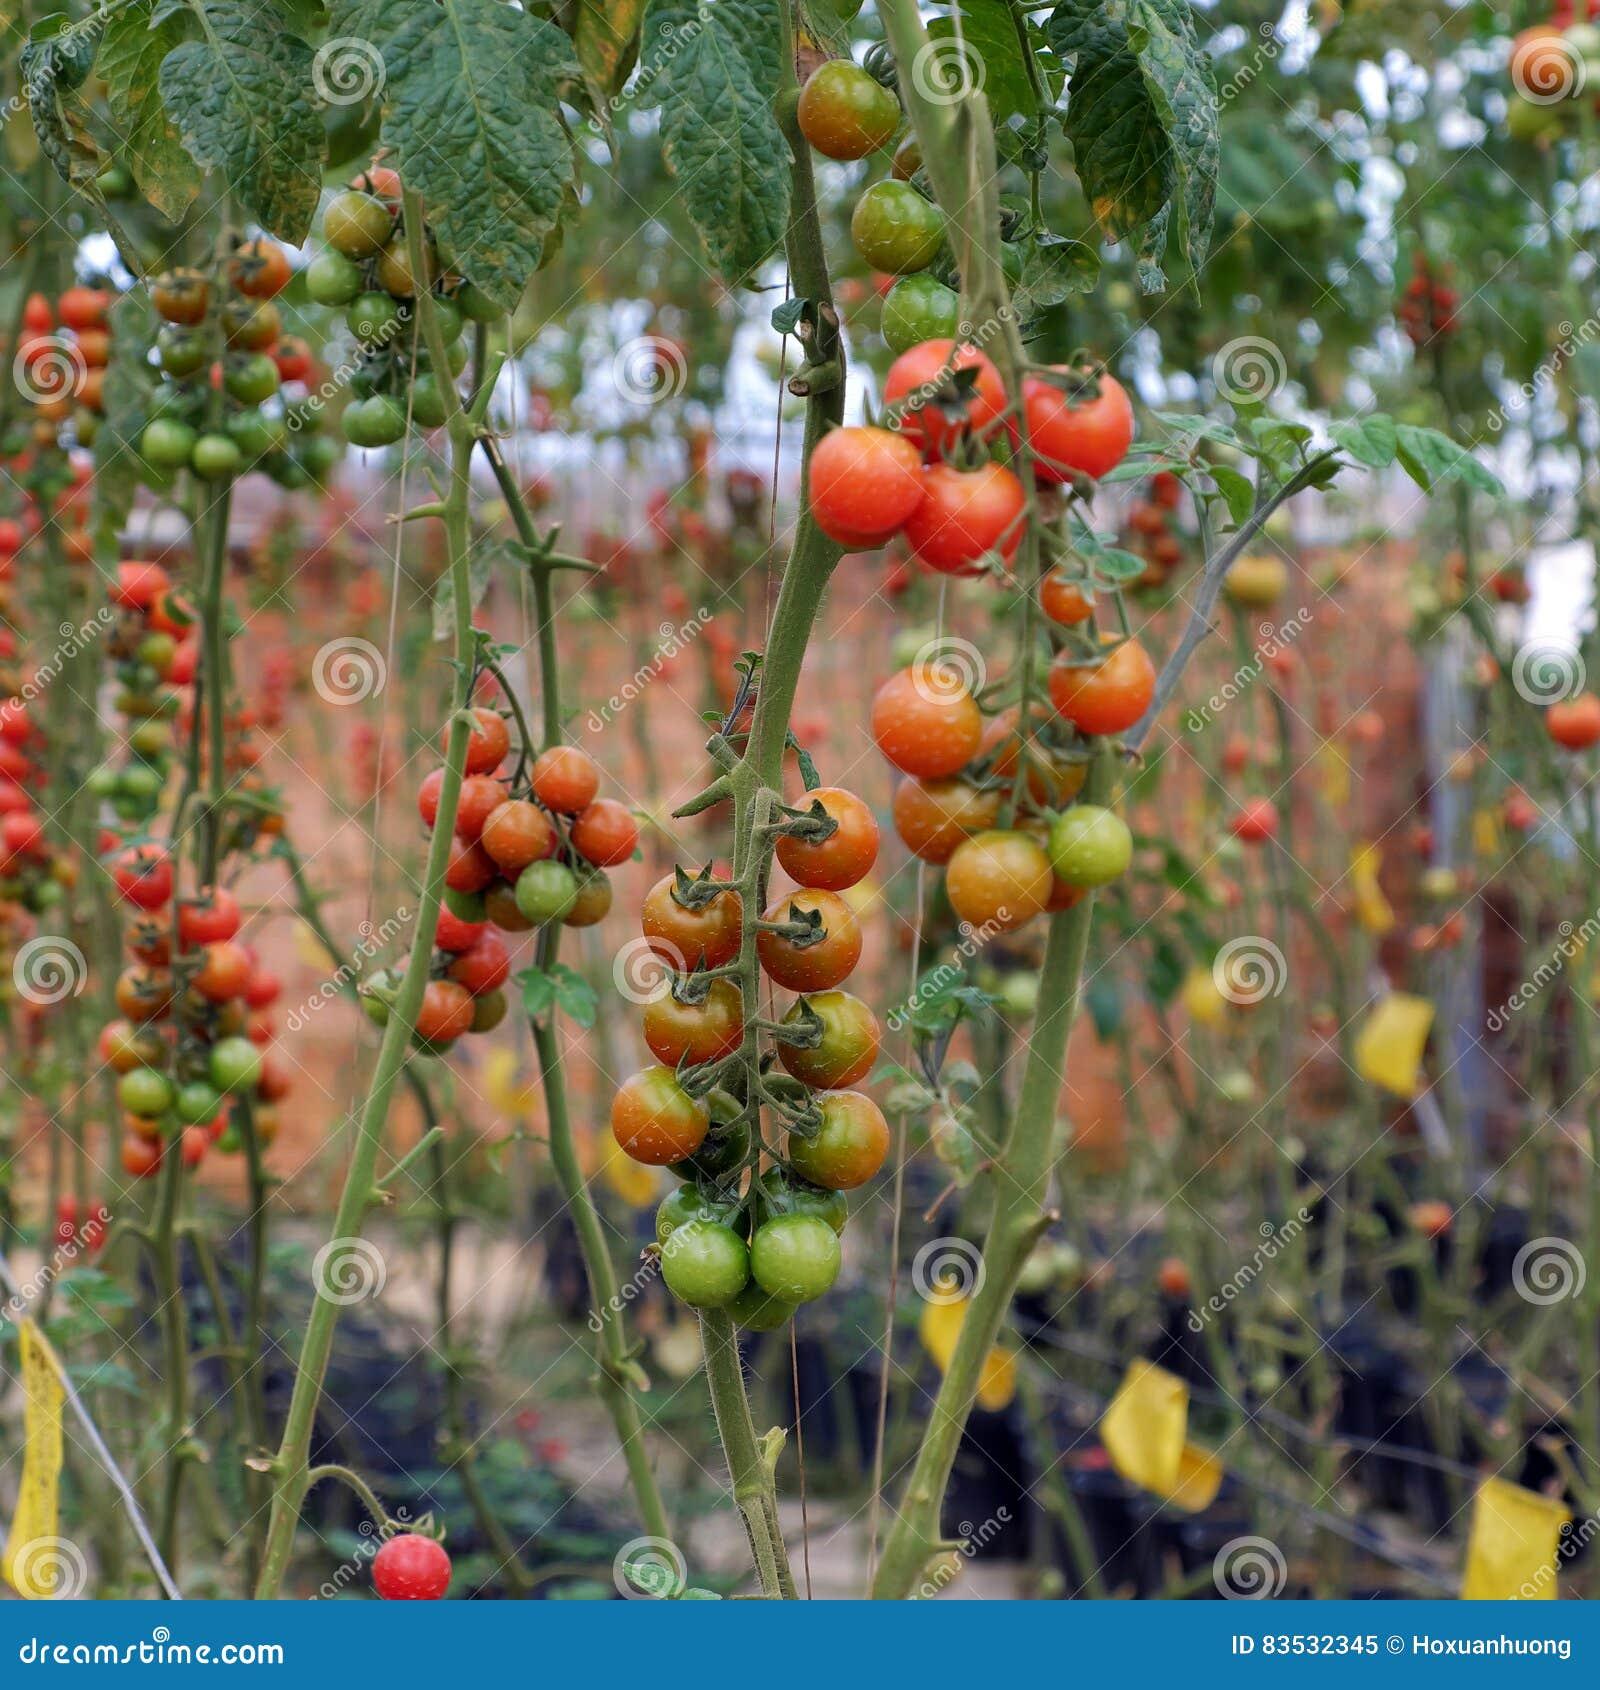 Safe Vegetable Farm, Da Lat Tomato Garden Stock Image - Image of ...